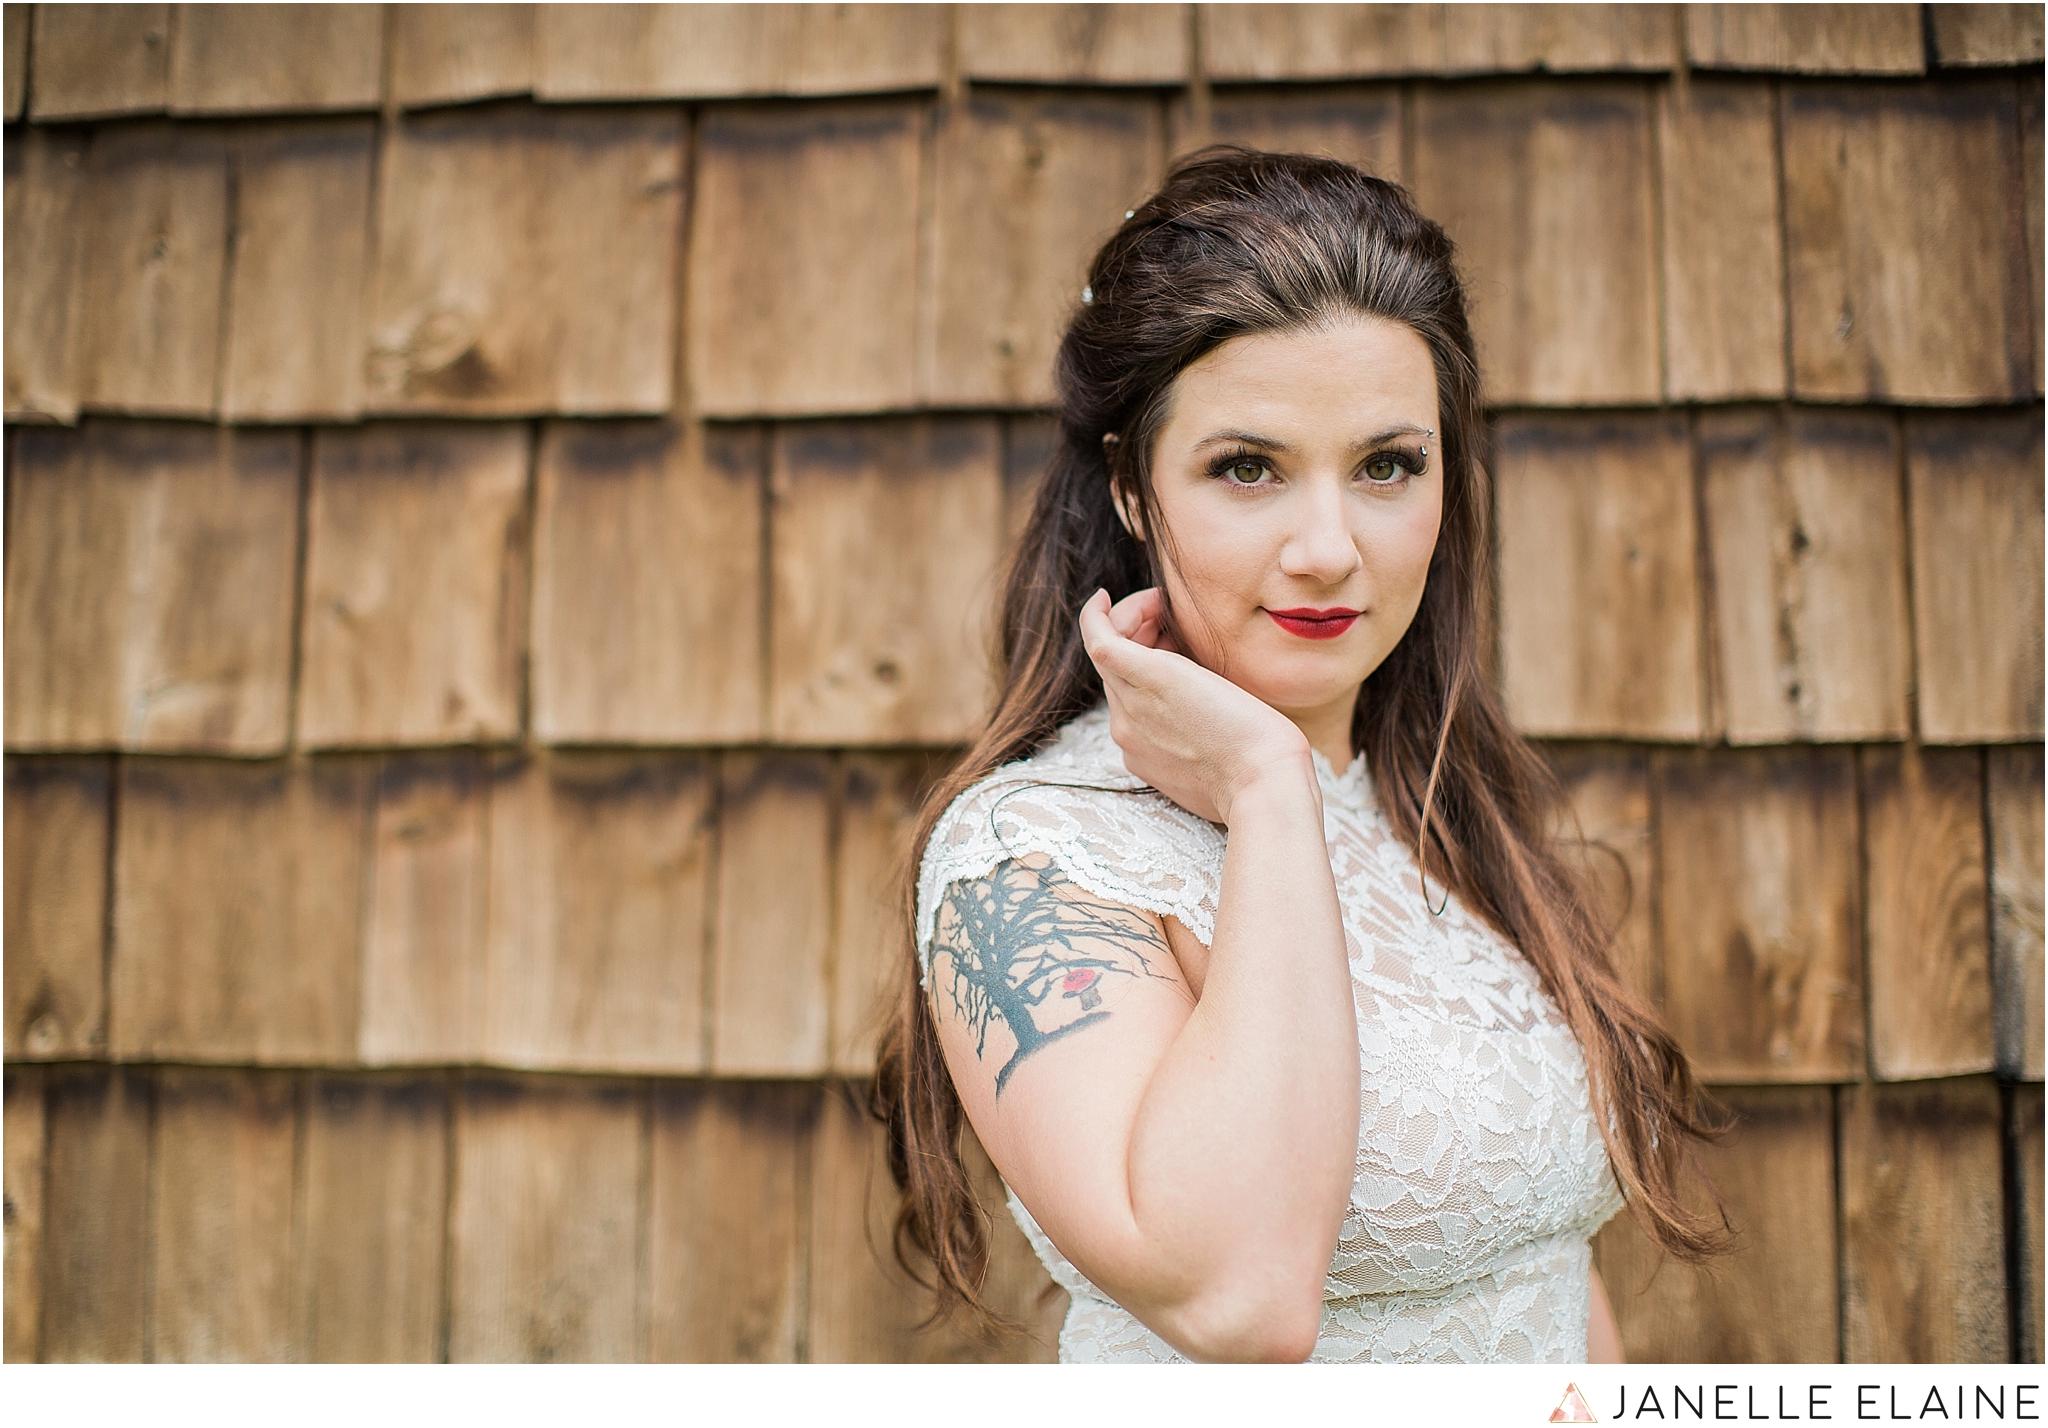 janelle elaine photography-seattle-destination-wedding-photographer-41.jpg